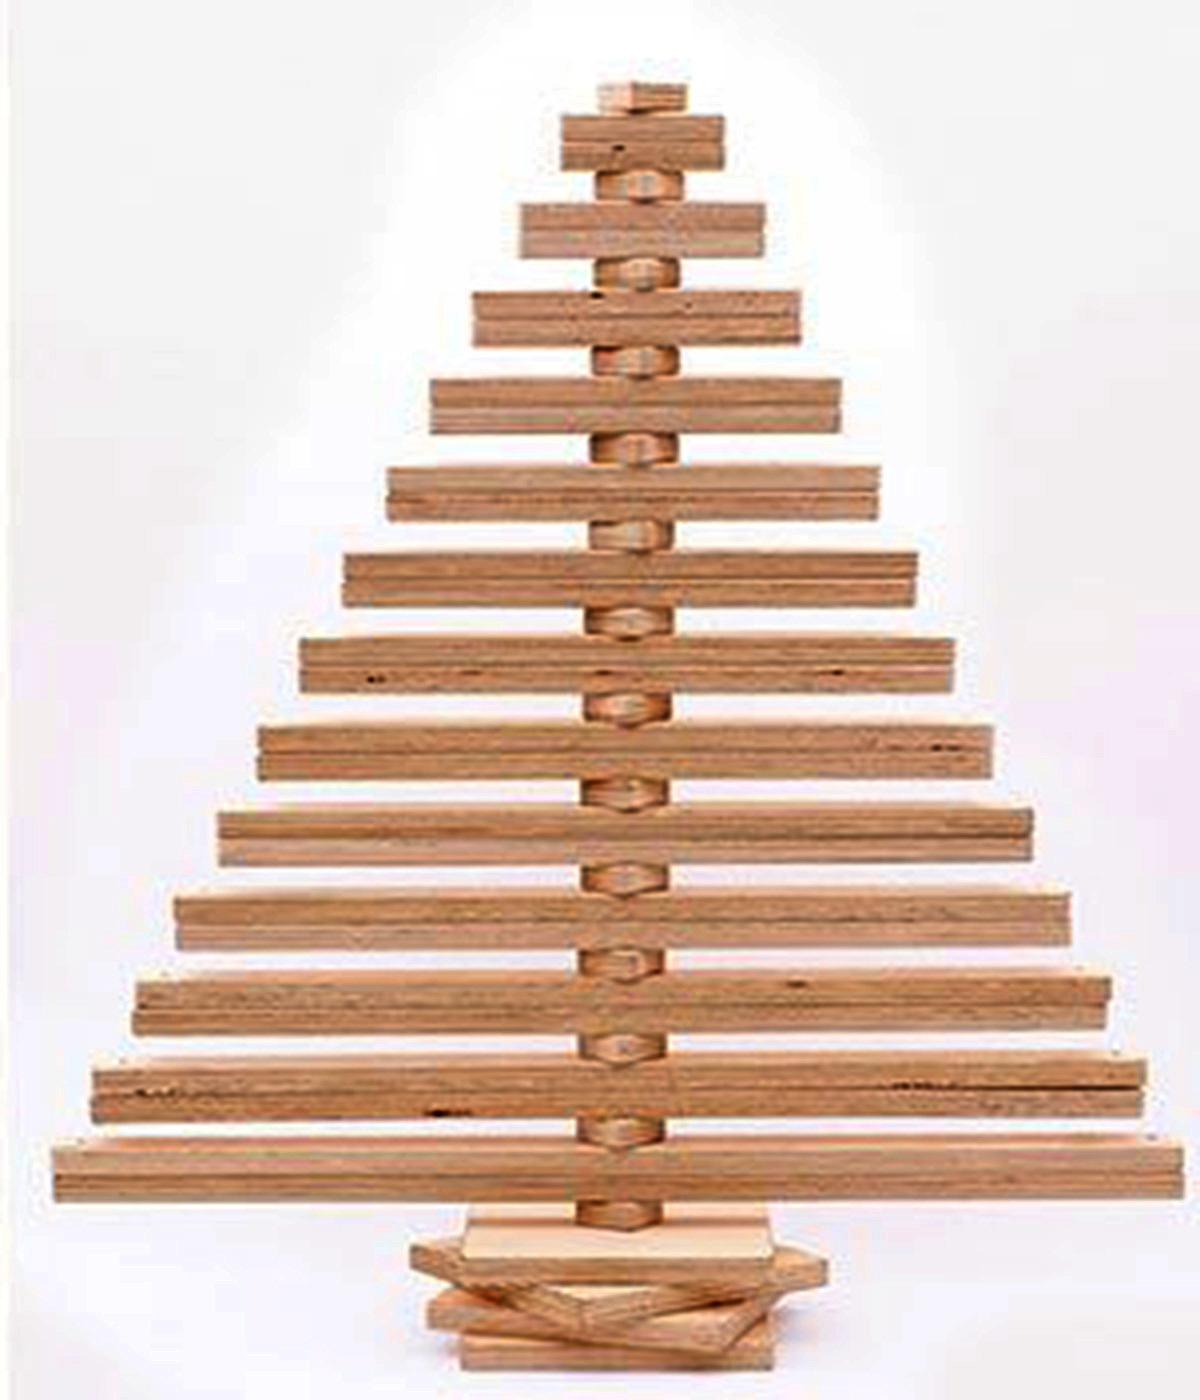 Arbol de madera 05